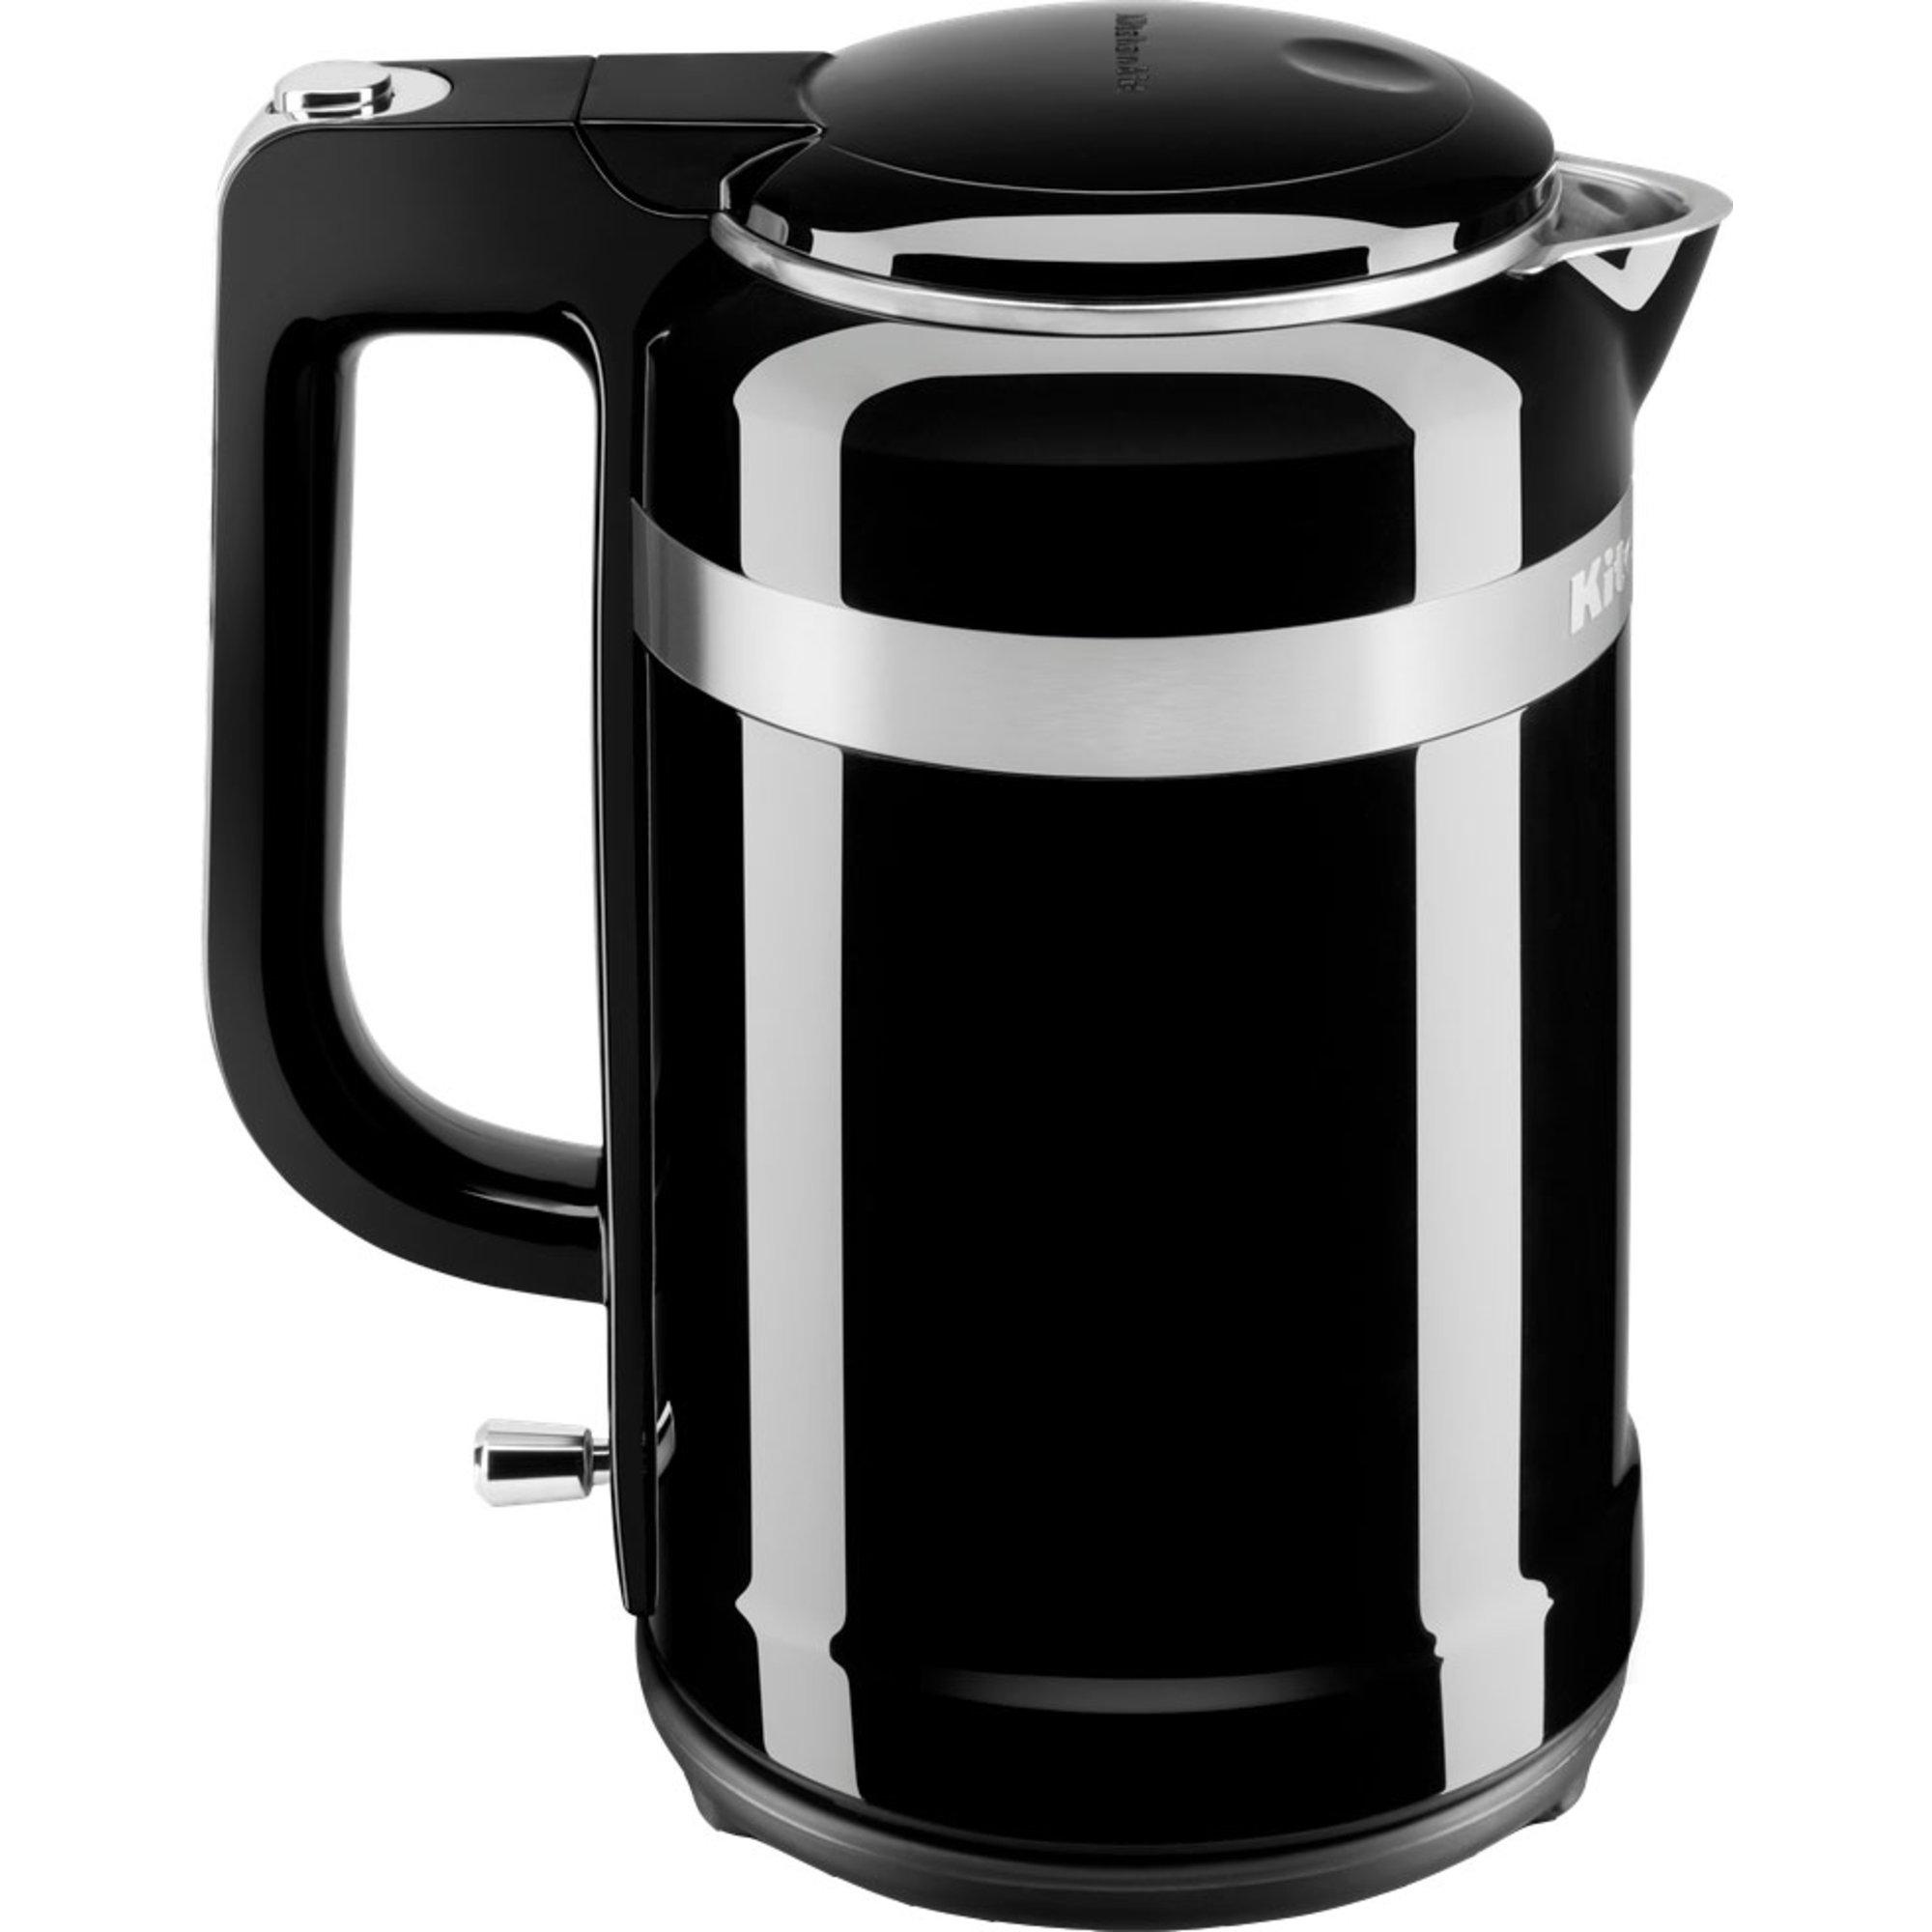 KitchenAid Vattenkokare 5KEK1565EOB 15 liter onyx black